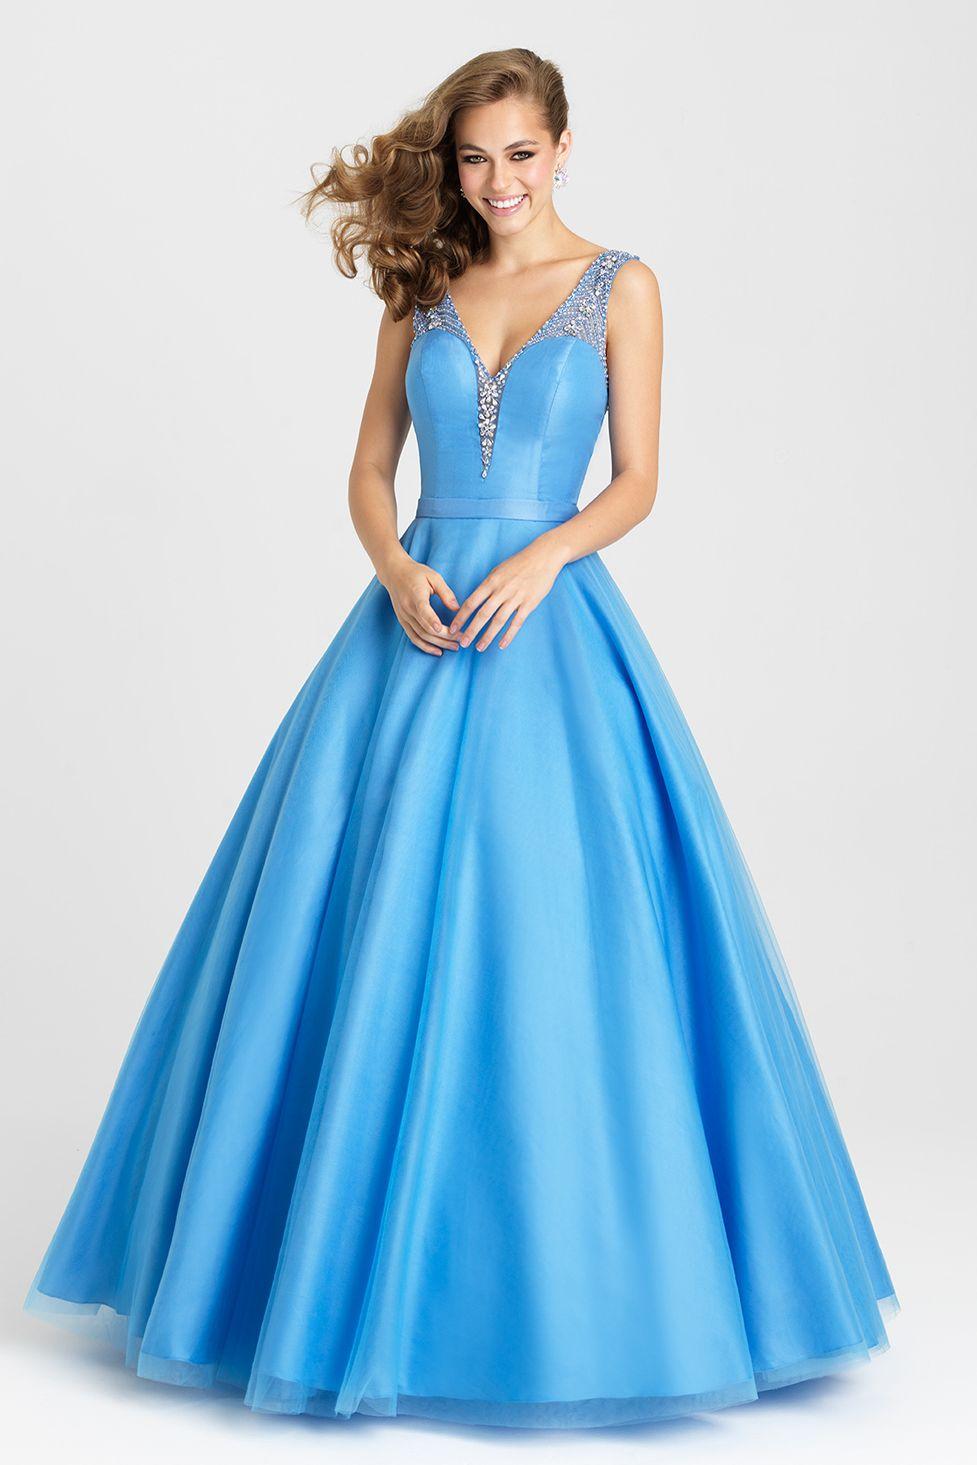 Prom Dresses | Style 16-376 | Ballgown | Gateway Bridal & Prom ...